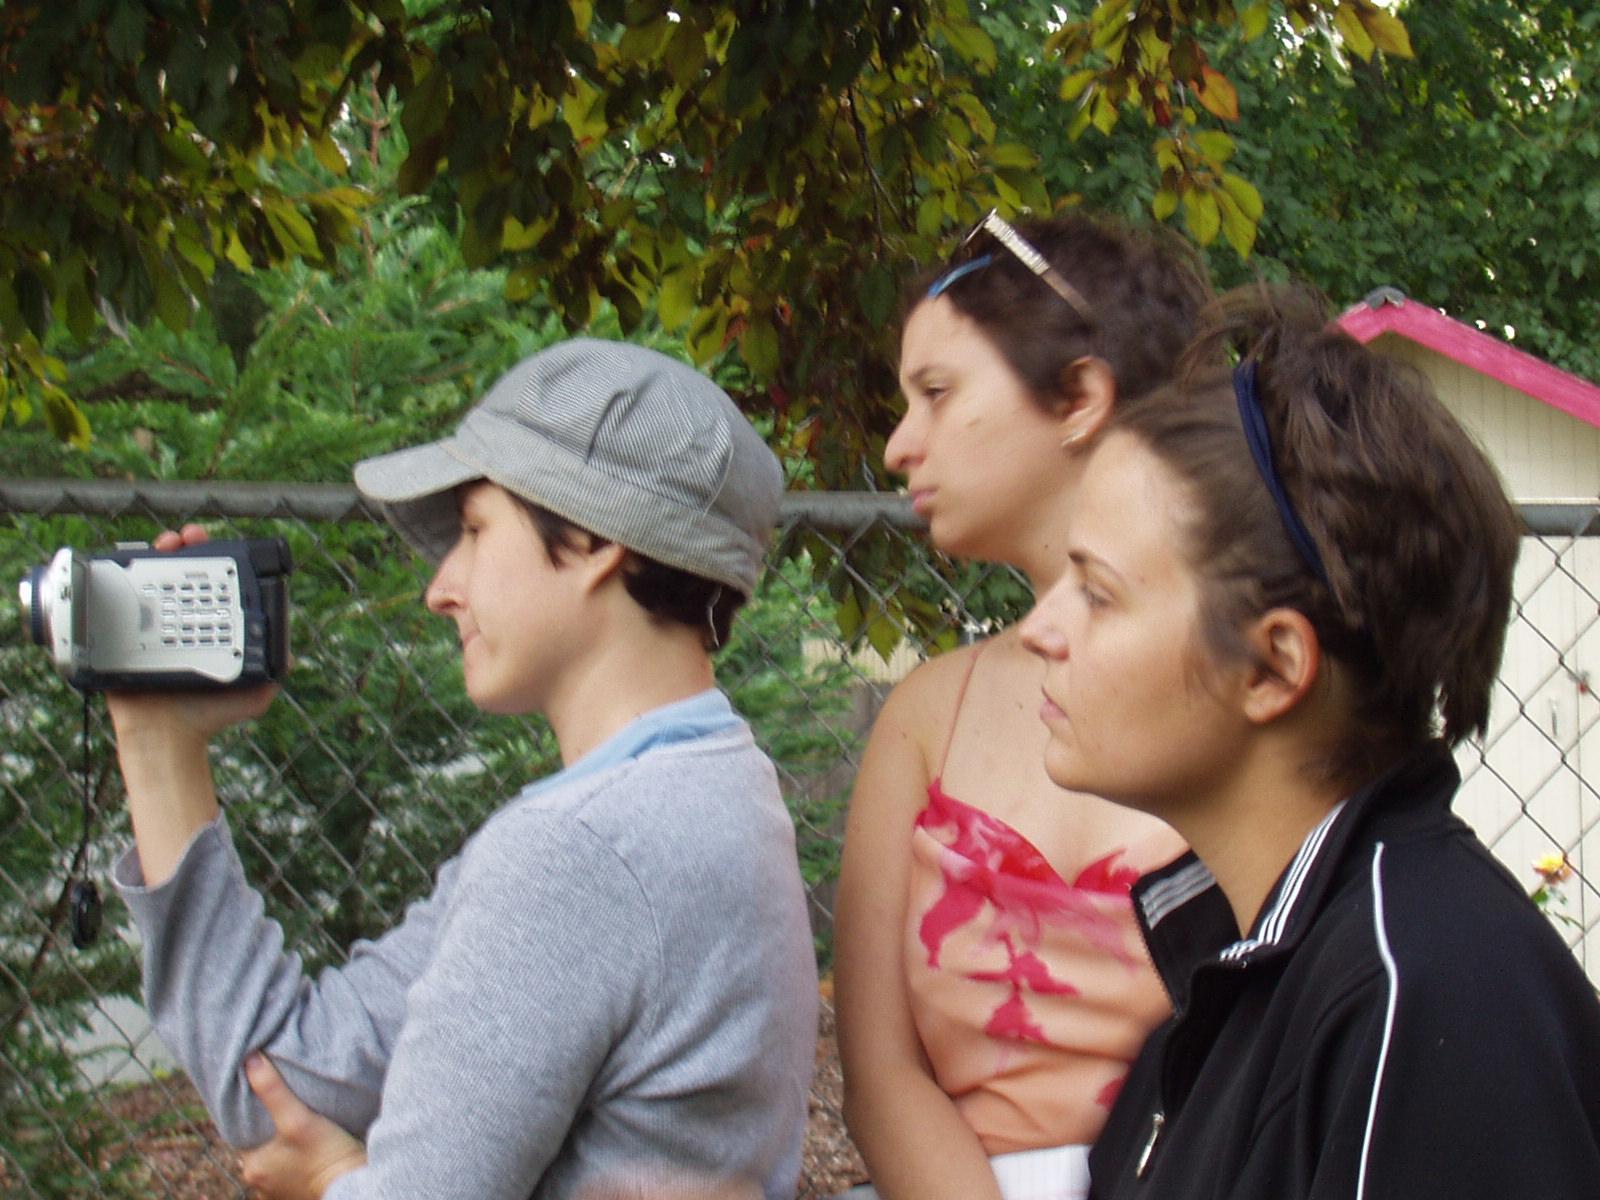 Filmmakers - Sel Staley,Mara Green and Eliza Greenwood